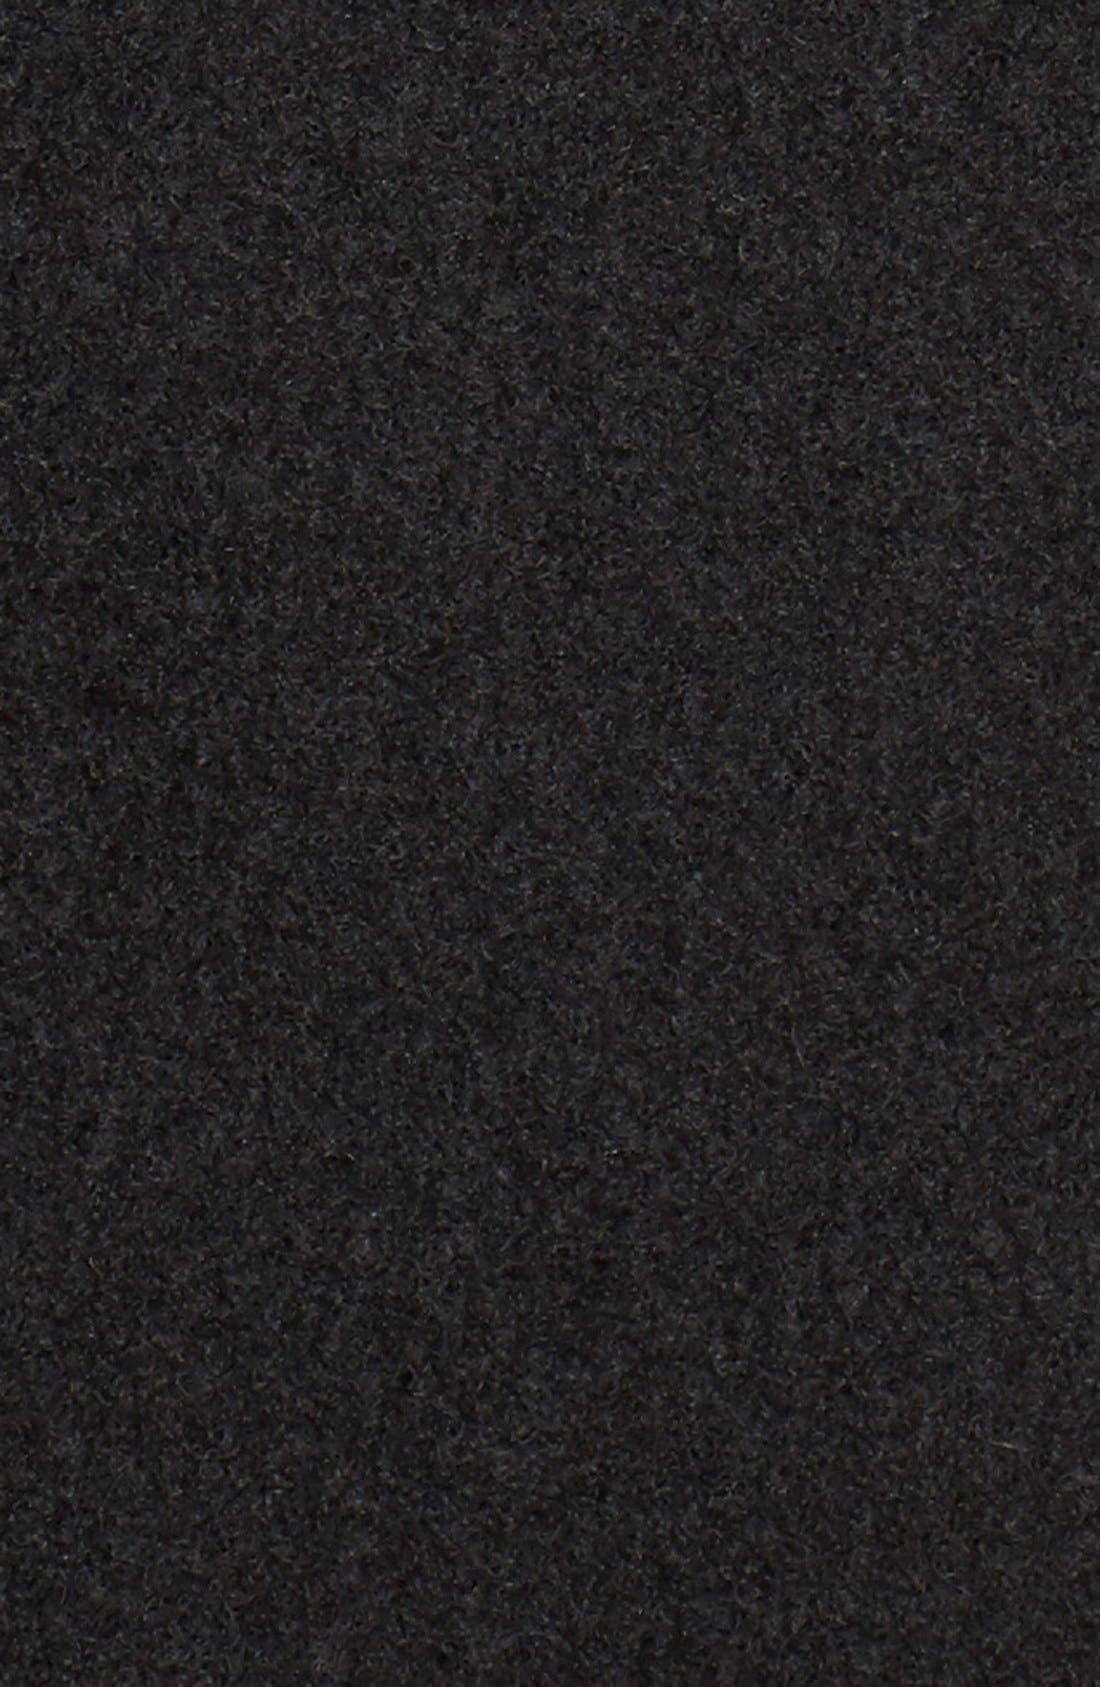 Fit & Flare Military Coat,                             Alternate thumbnail 2, color,                             001